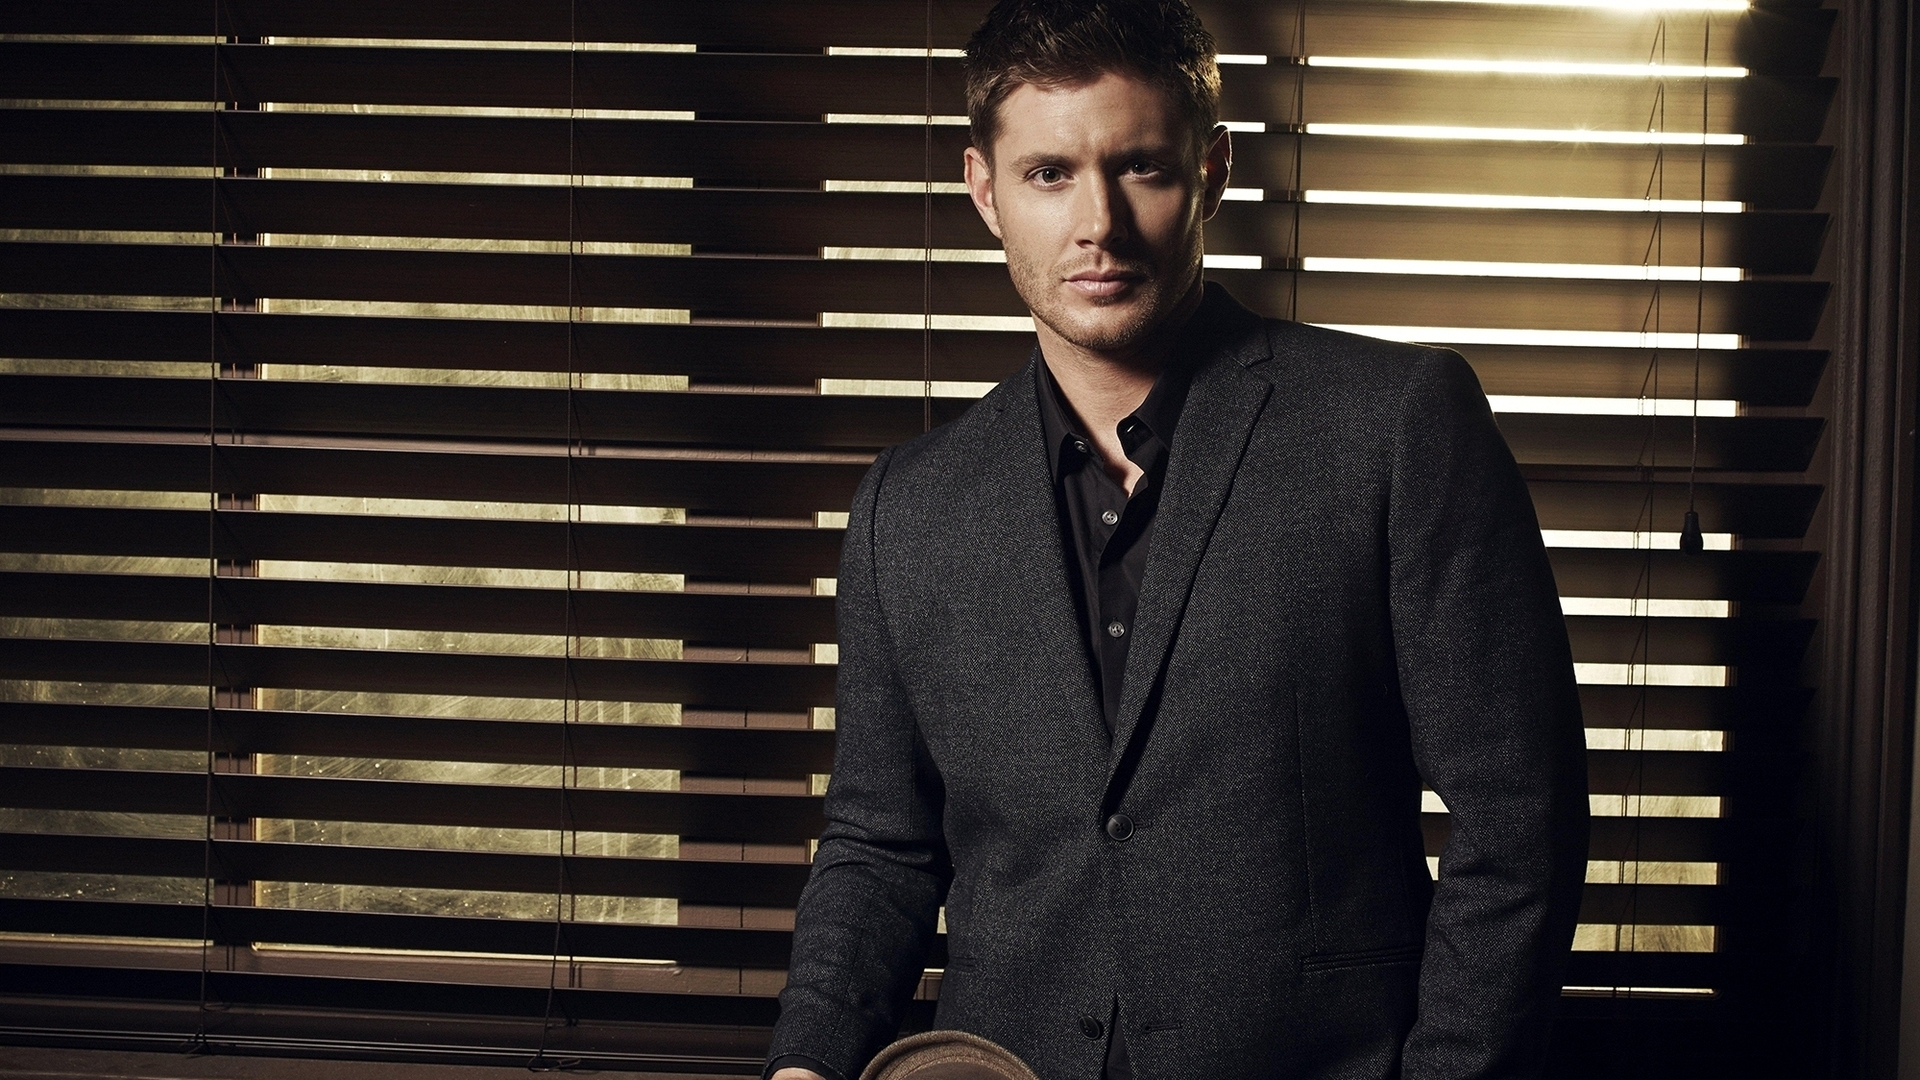 Jensen Ackles Hd Wallpaper